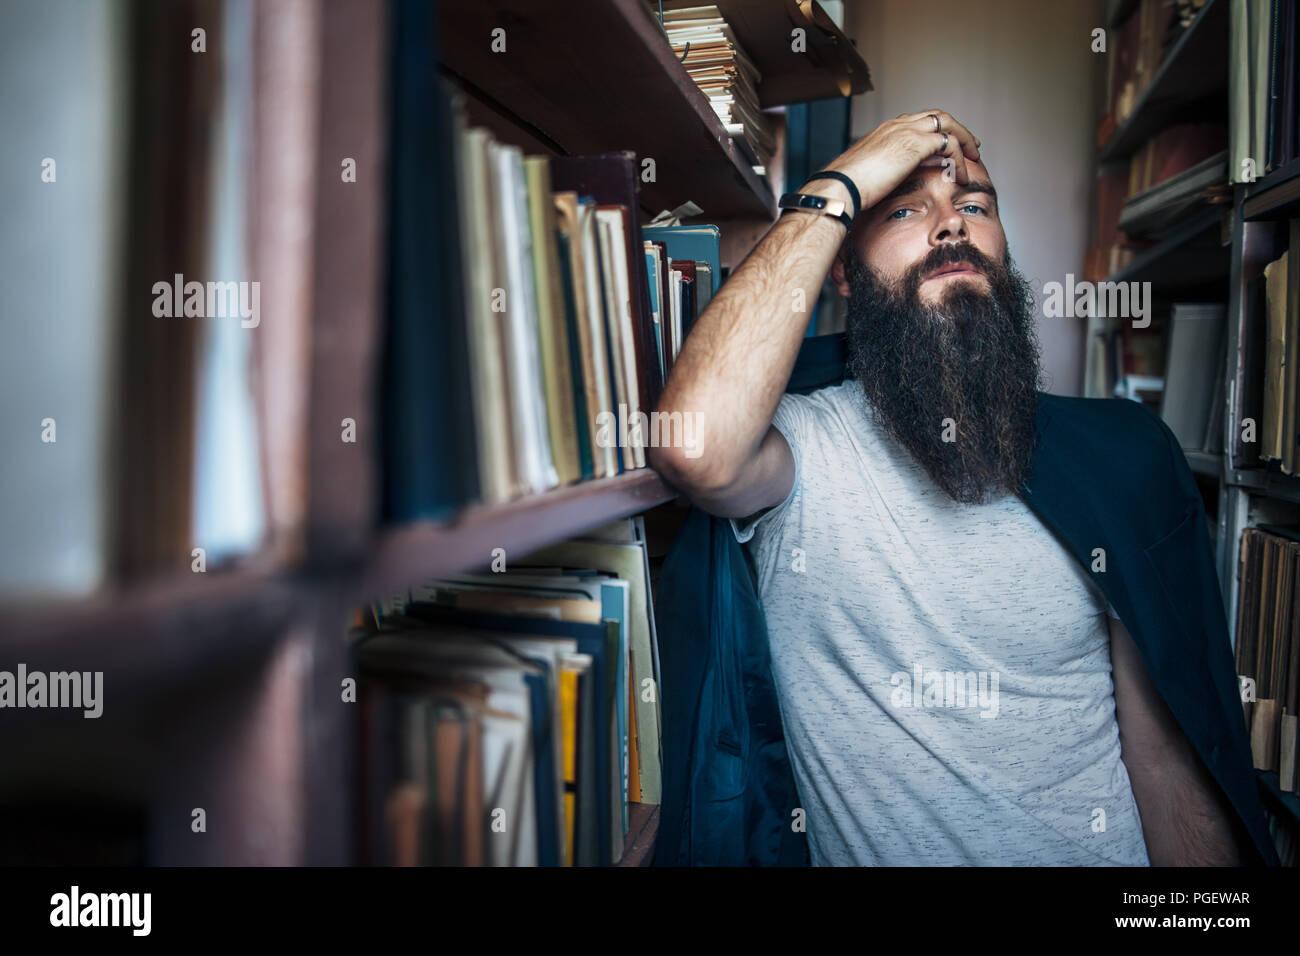 Thoughtful hipster man among bookshelves. Depression concept - Stock Image